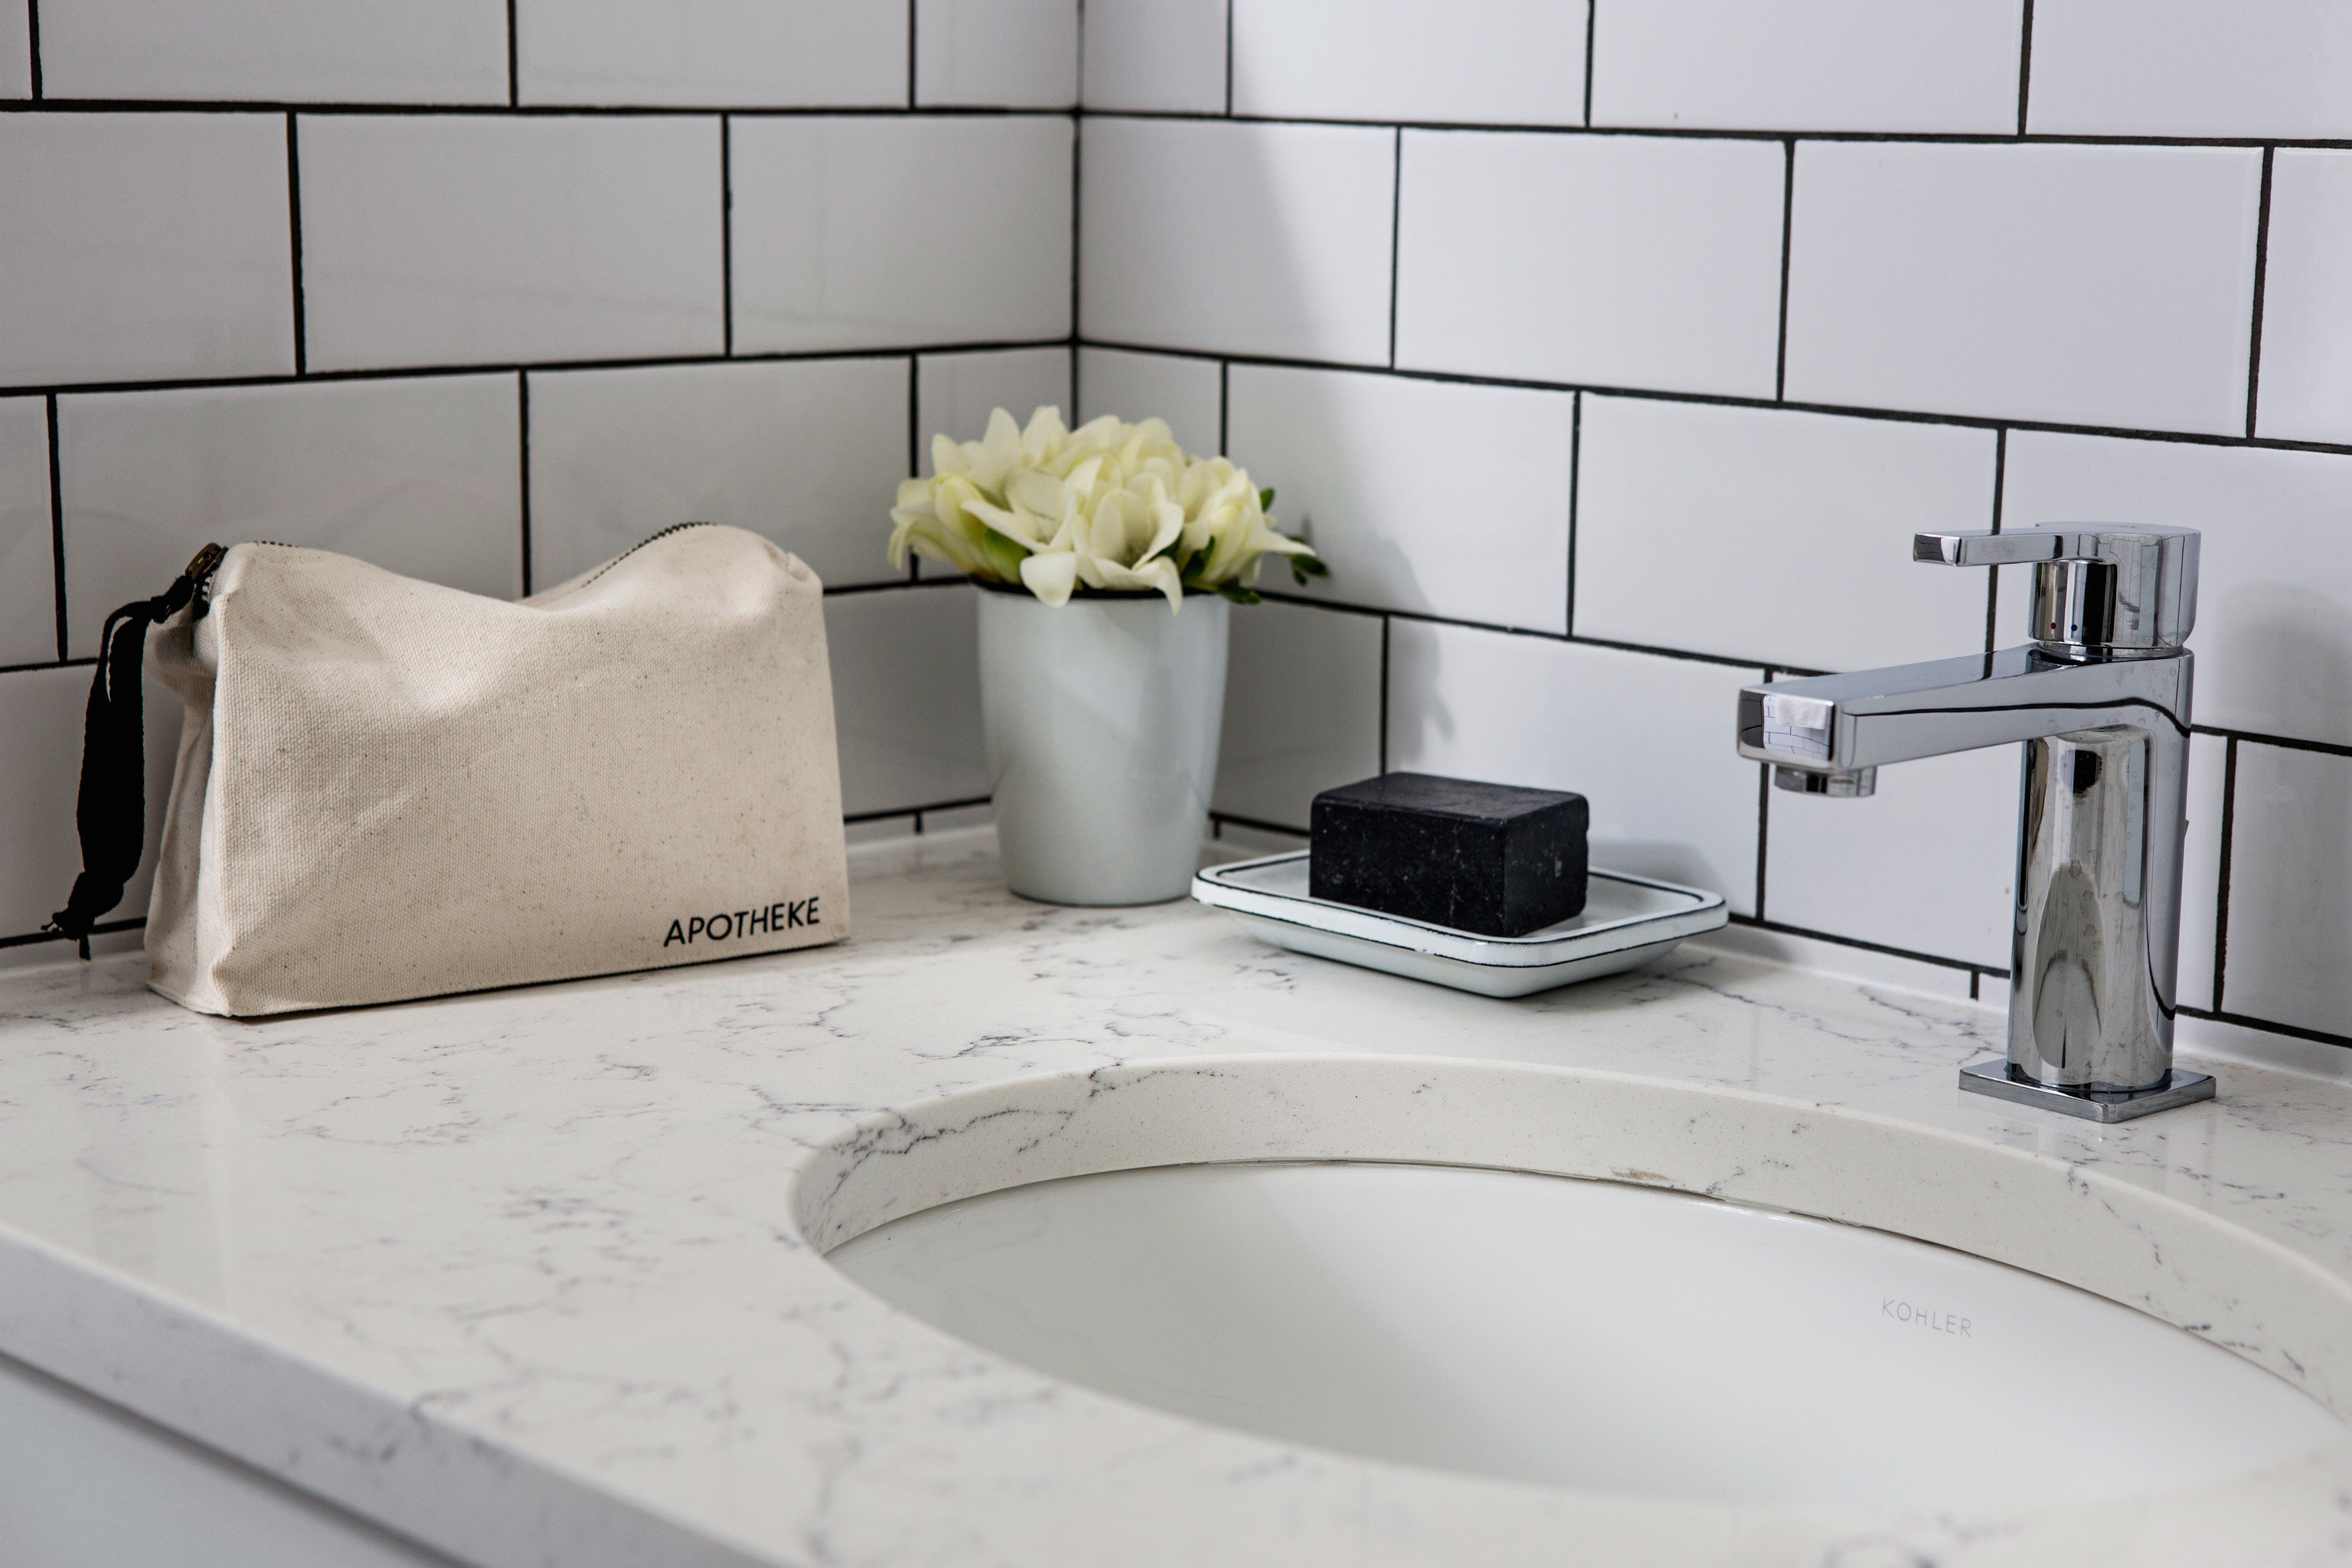 bathtub toilet plumbing fixture tile bathroom bidet flooring sink tap countertop water basin